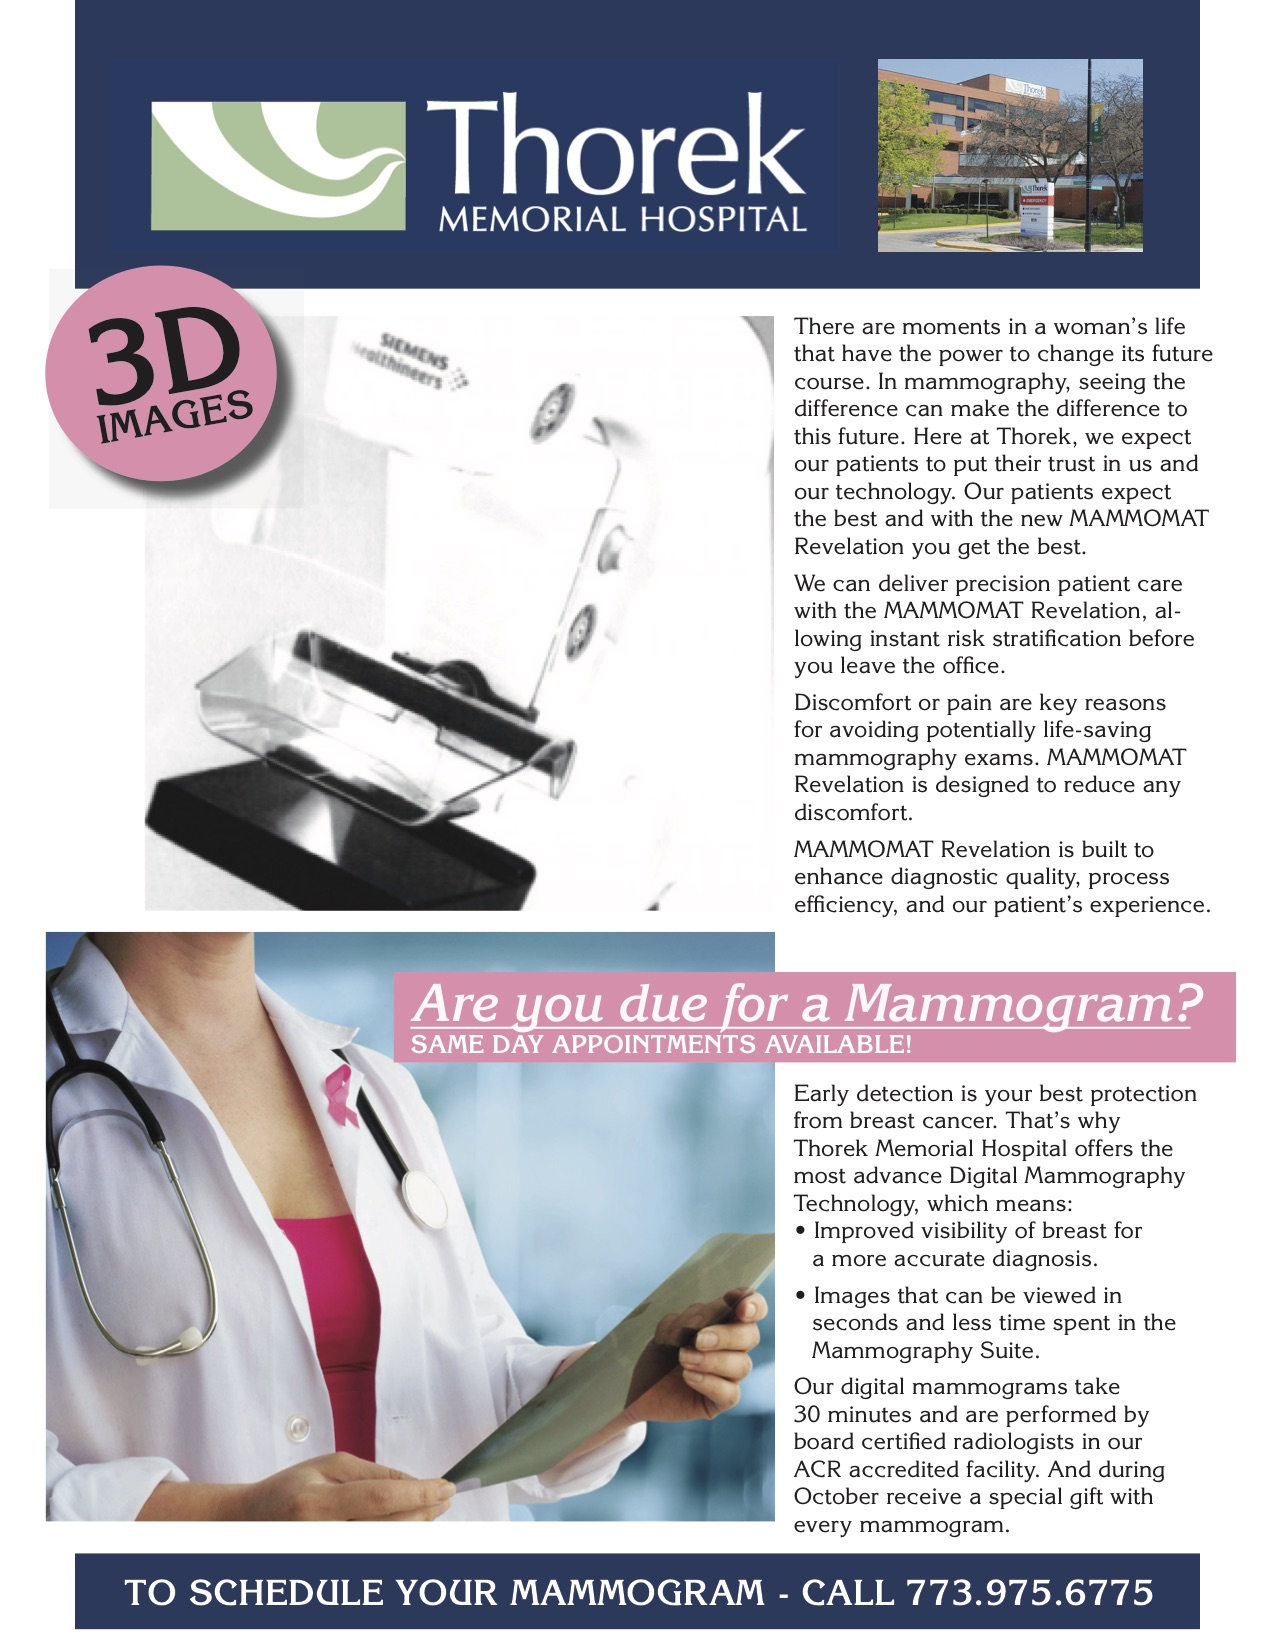 ChicagoHospitalMammogram